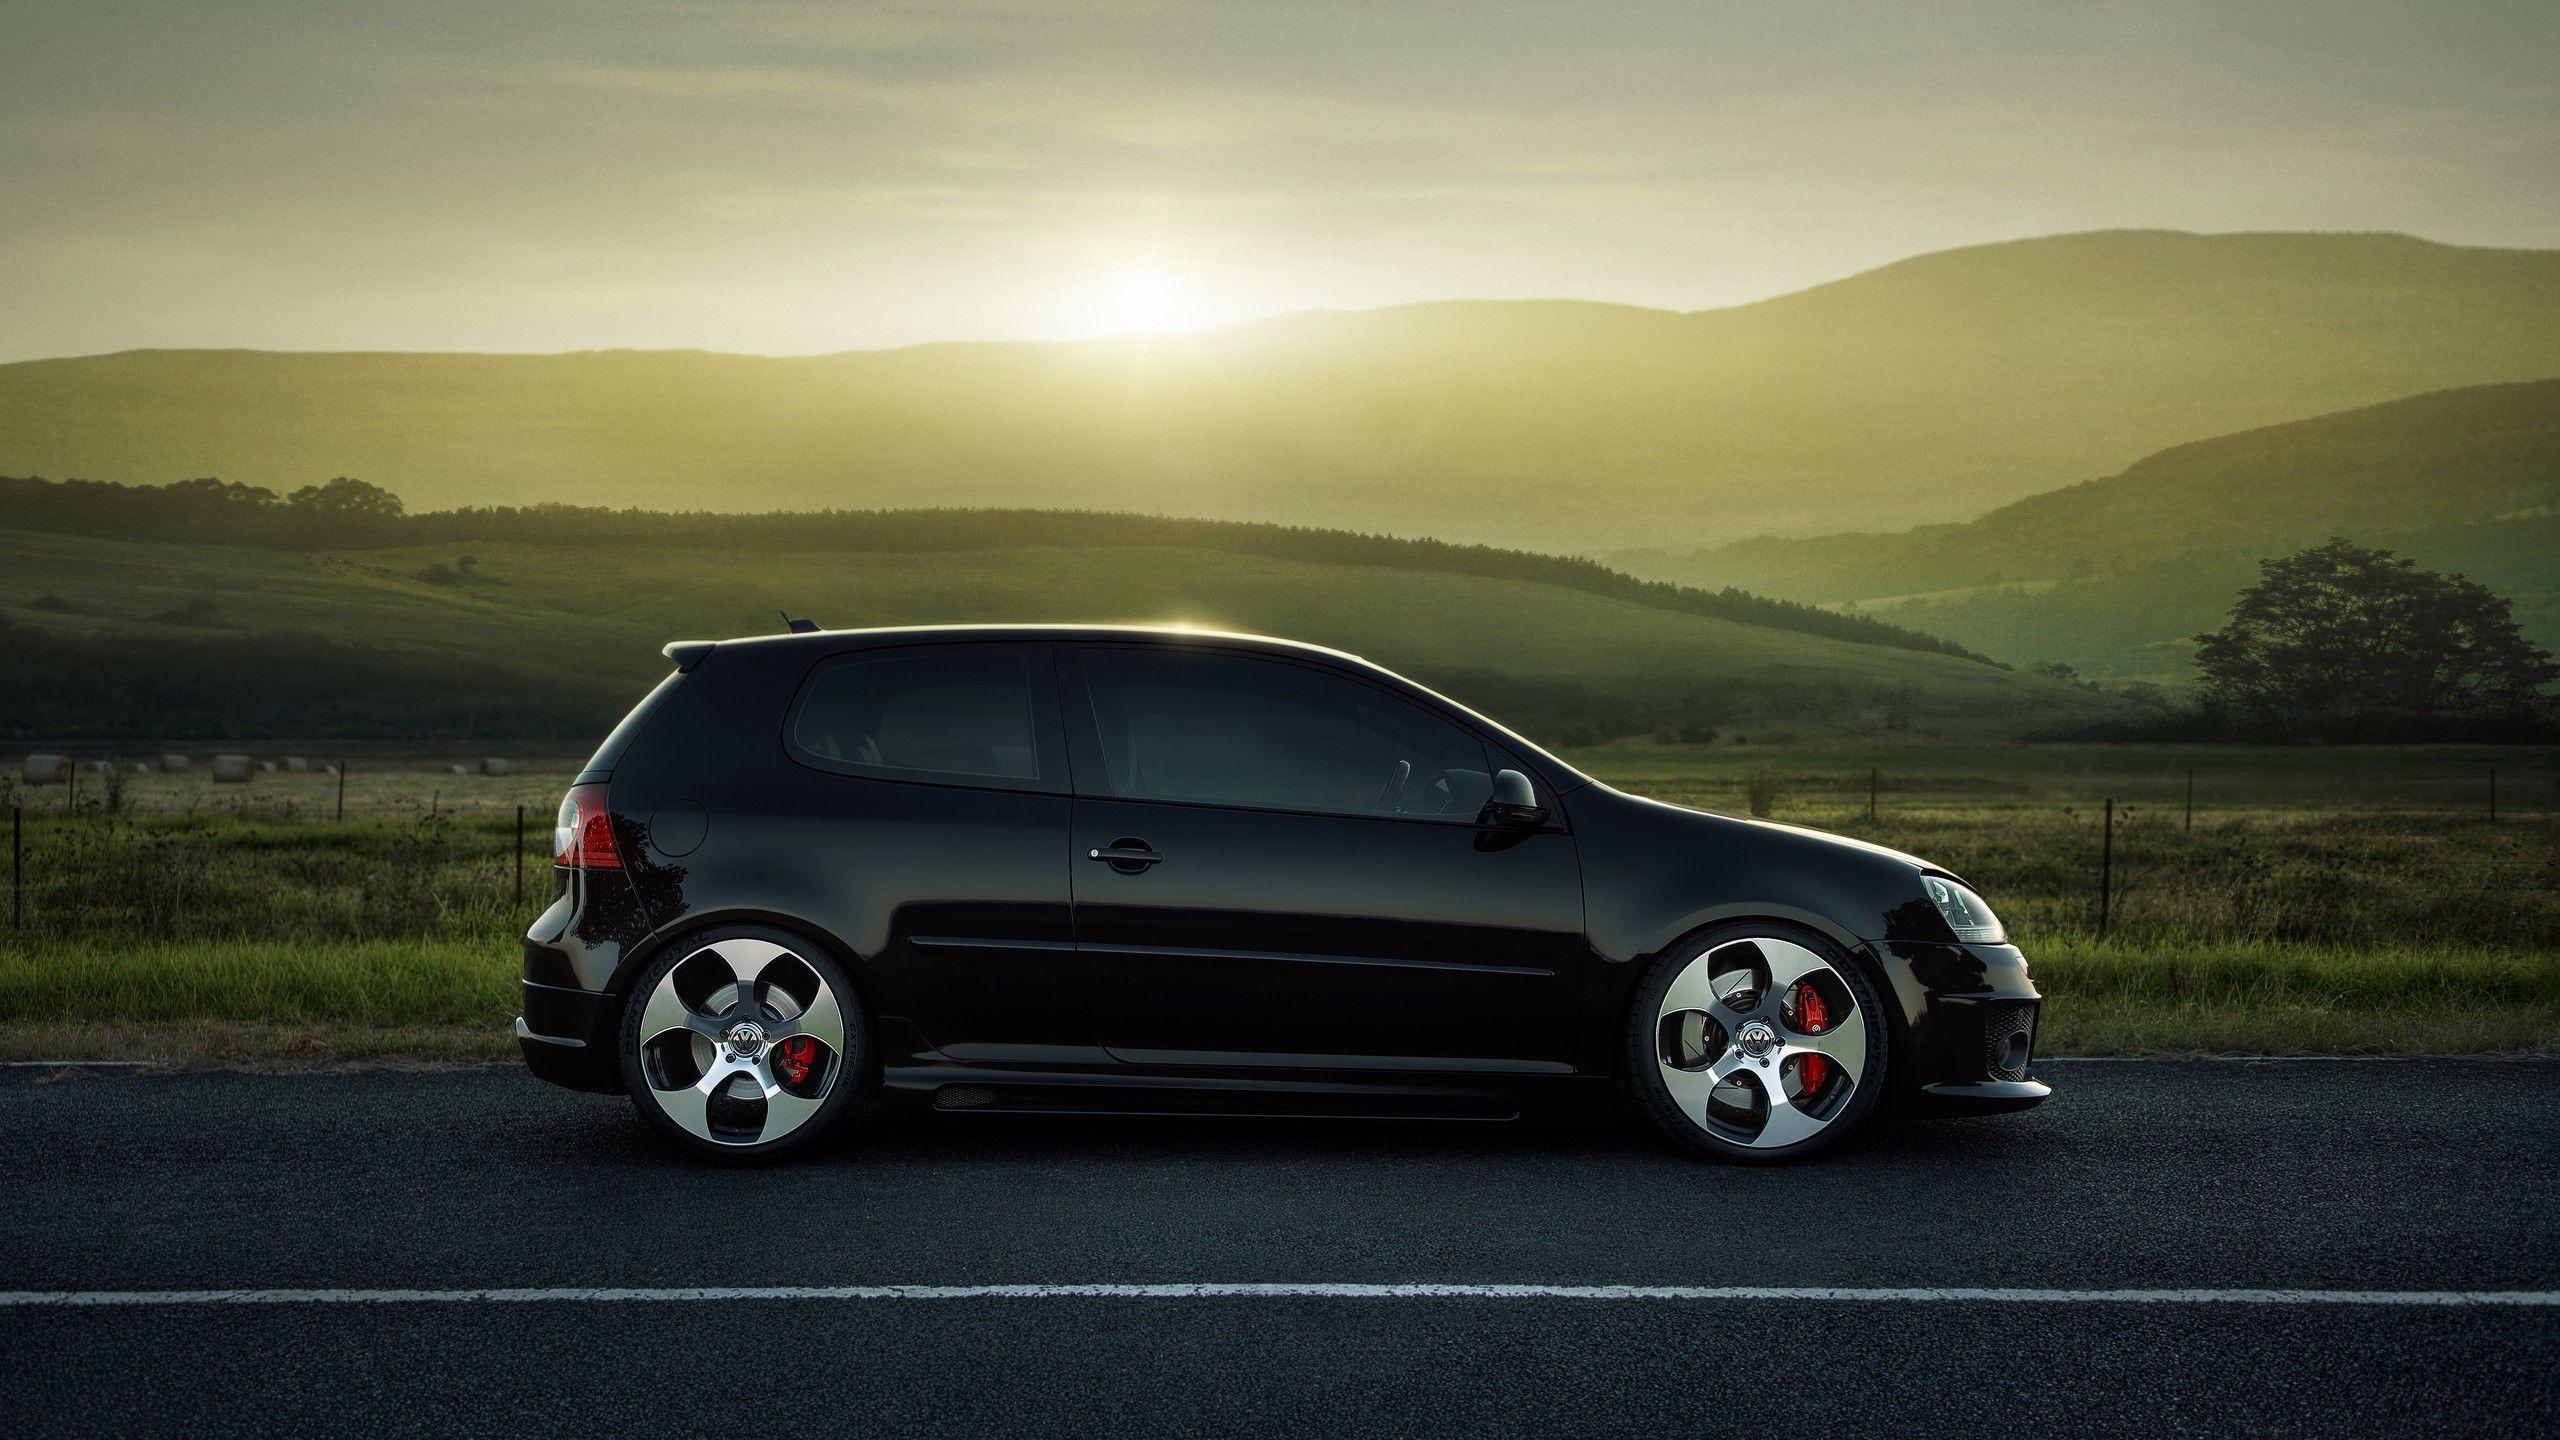 VW GTI Wallpapers